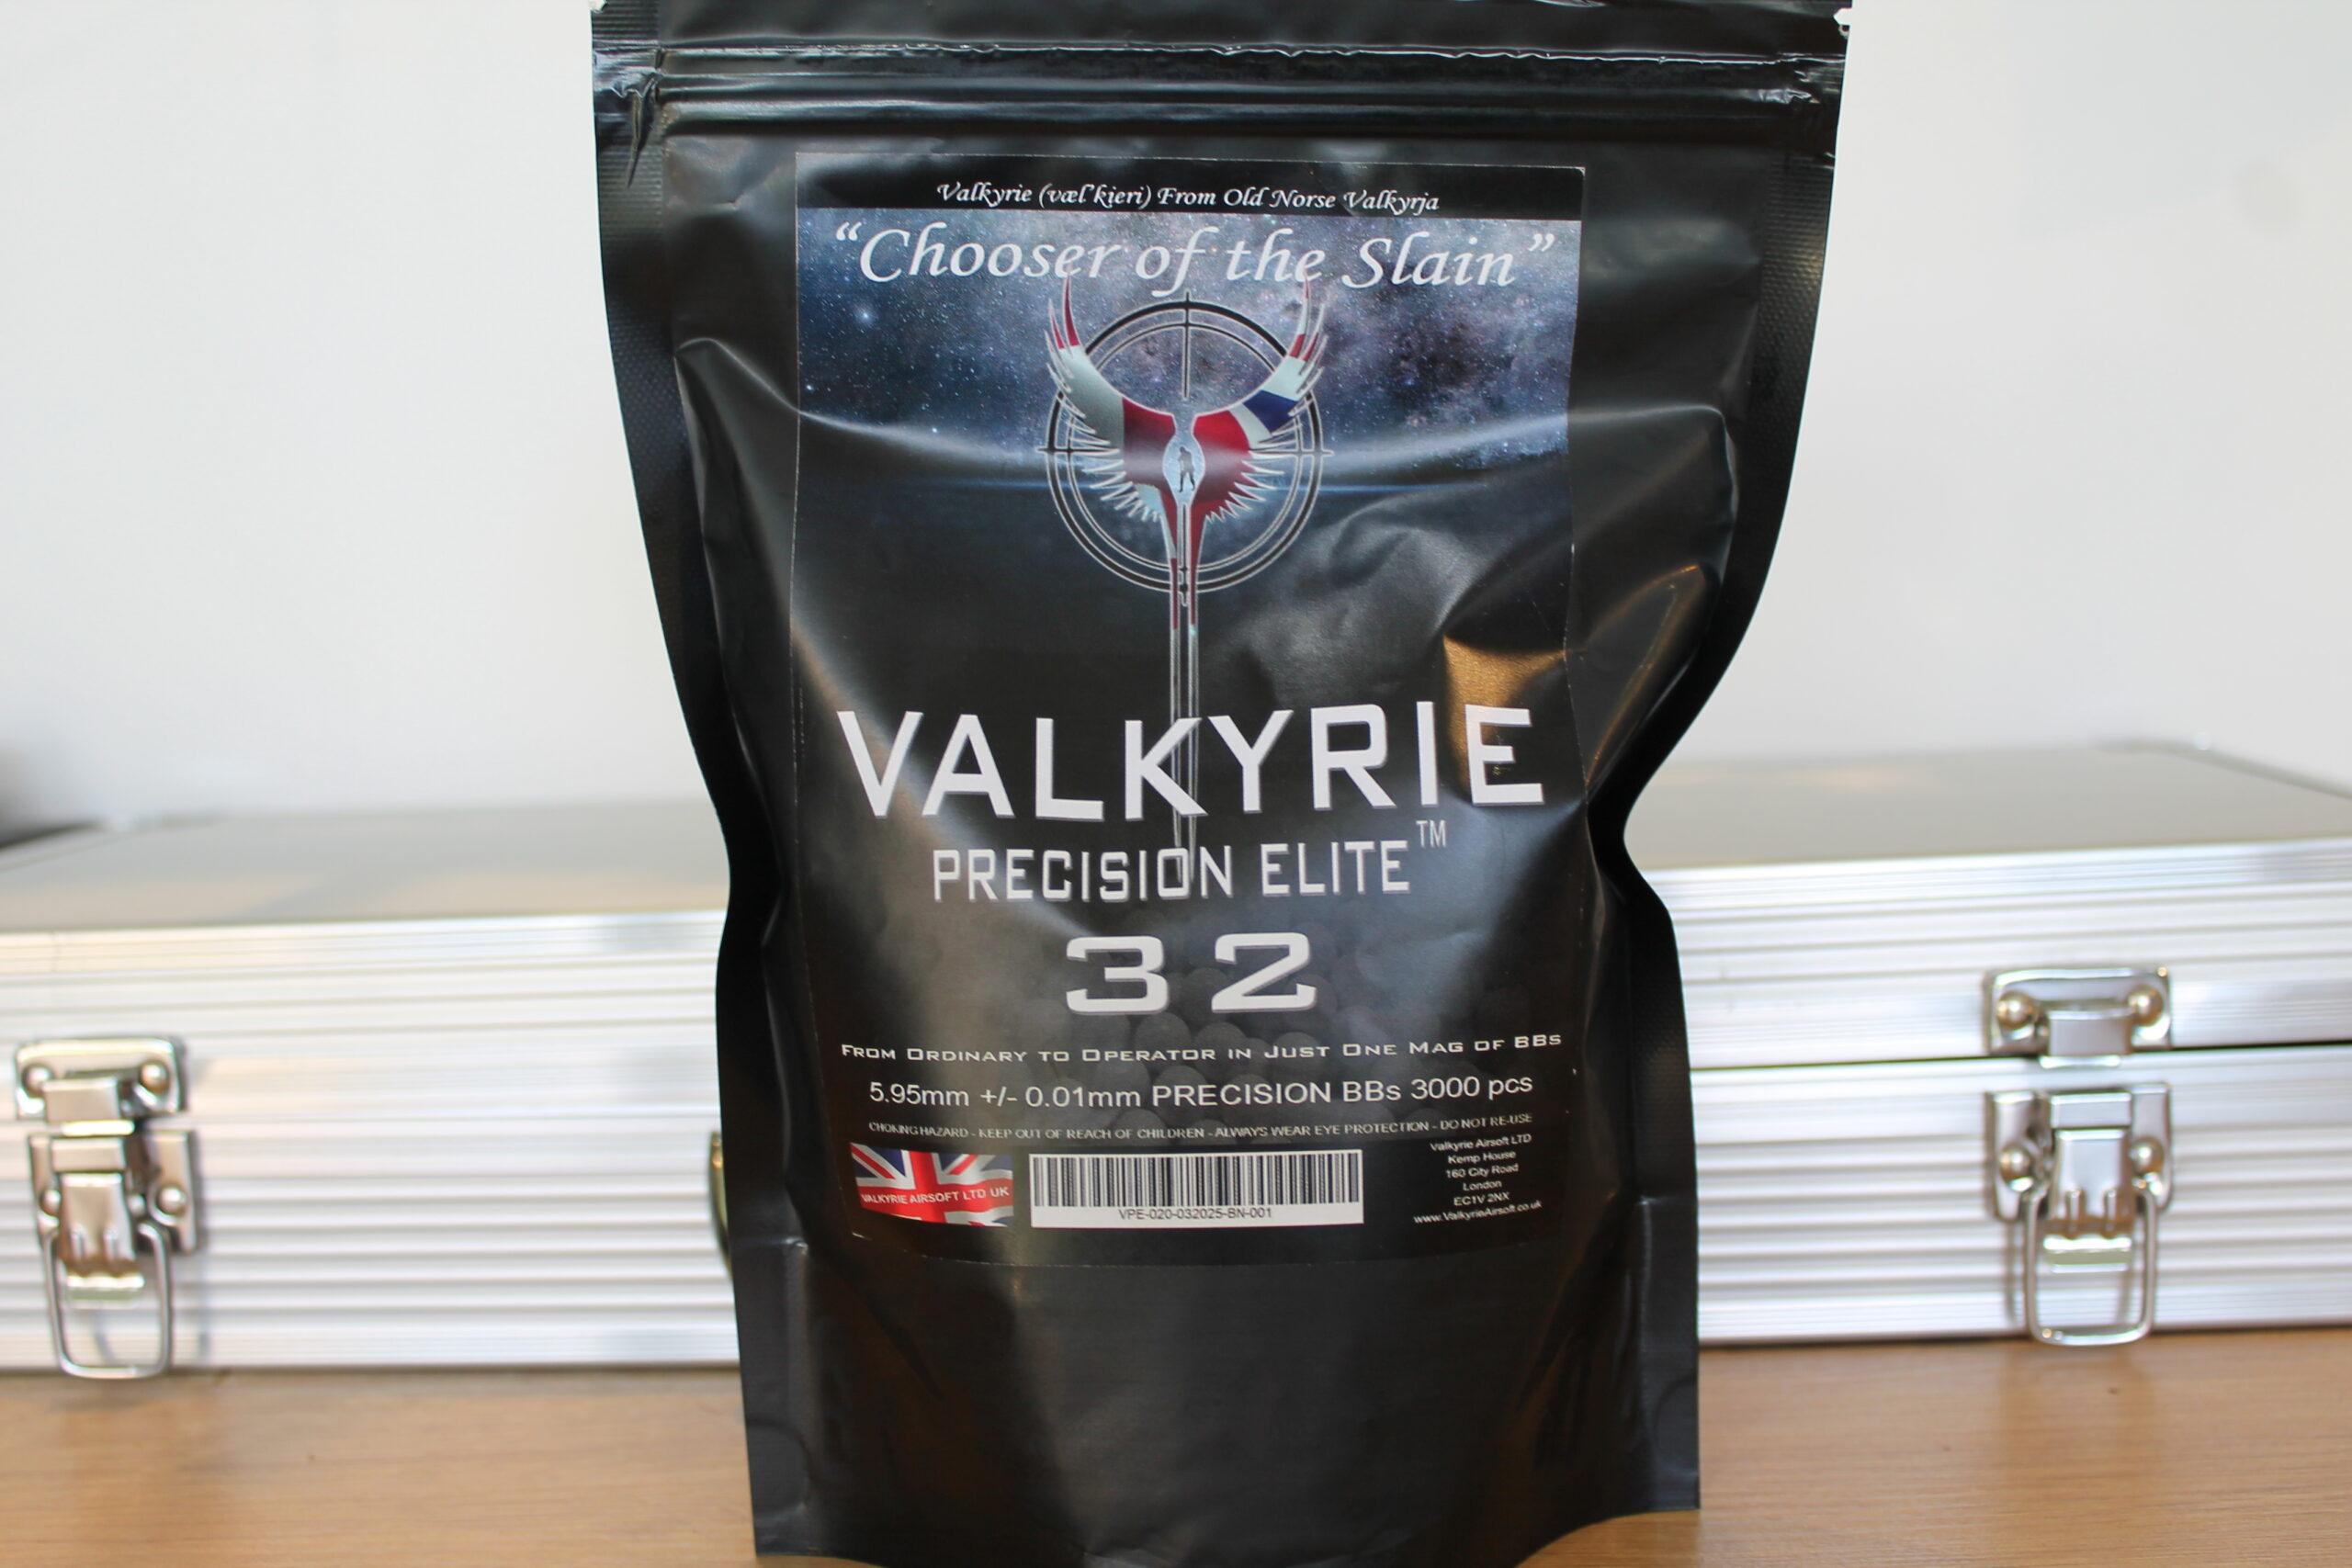 32s Valkyrie Precision Elite Premium BBs - Consistent - Precise - Accurate - Magical